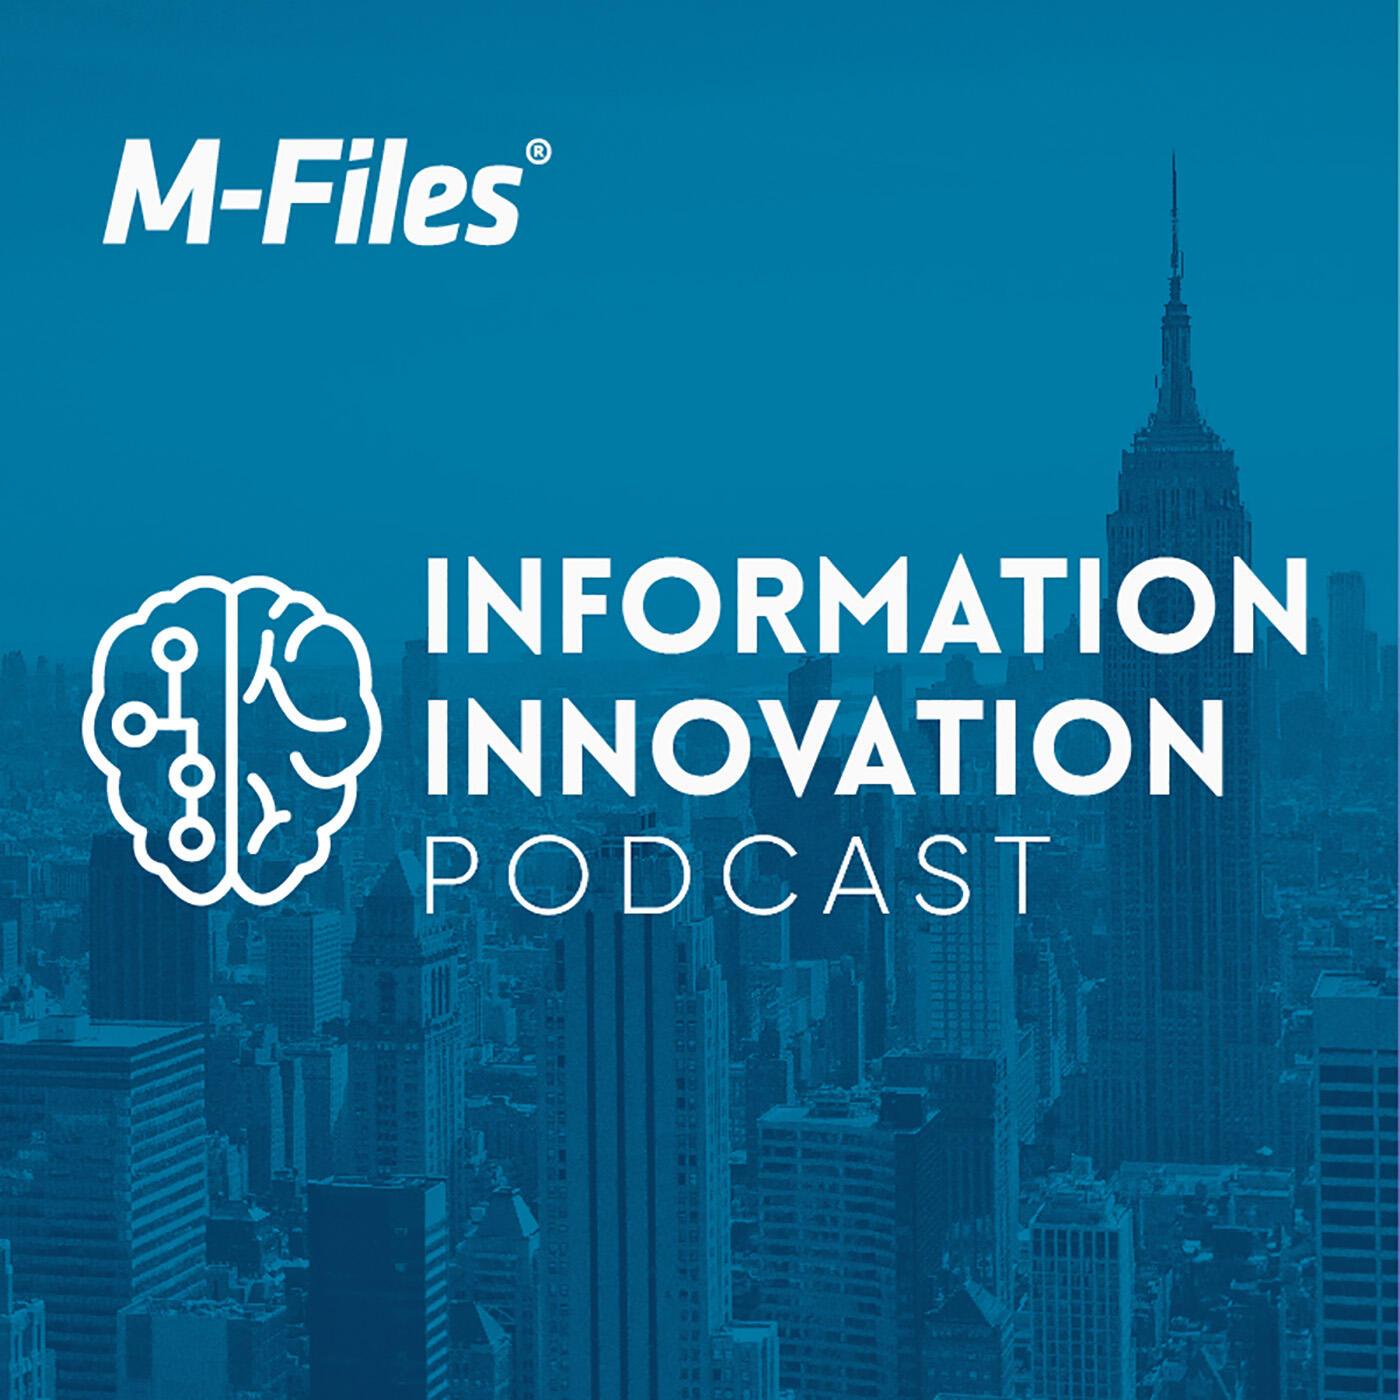 Information Innovation Podcast